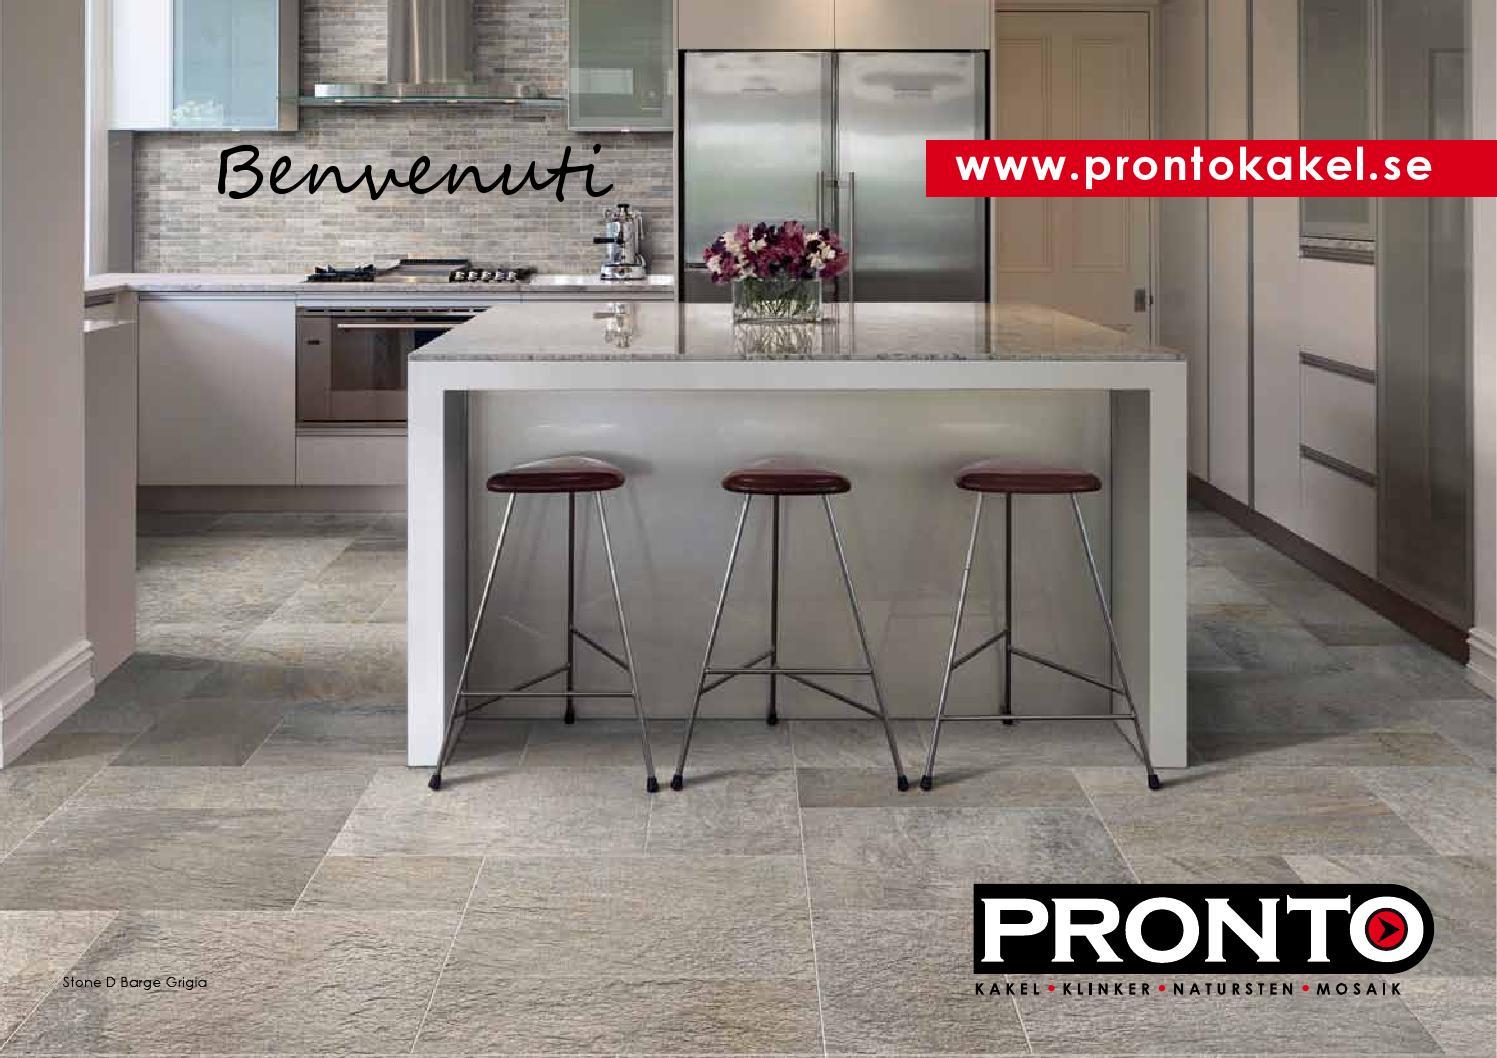 Prontokakel katalog by pronto kakel®   issuu